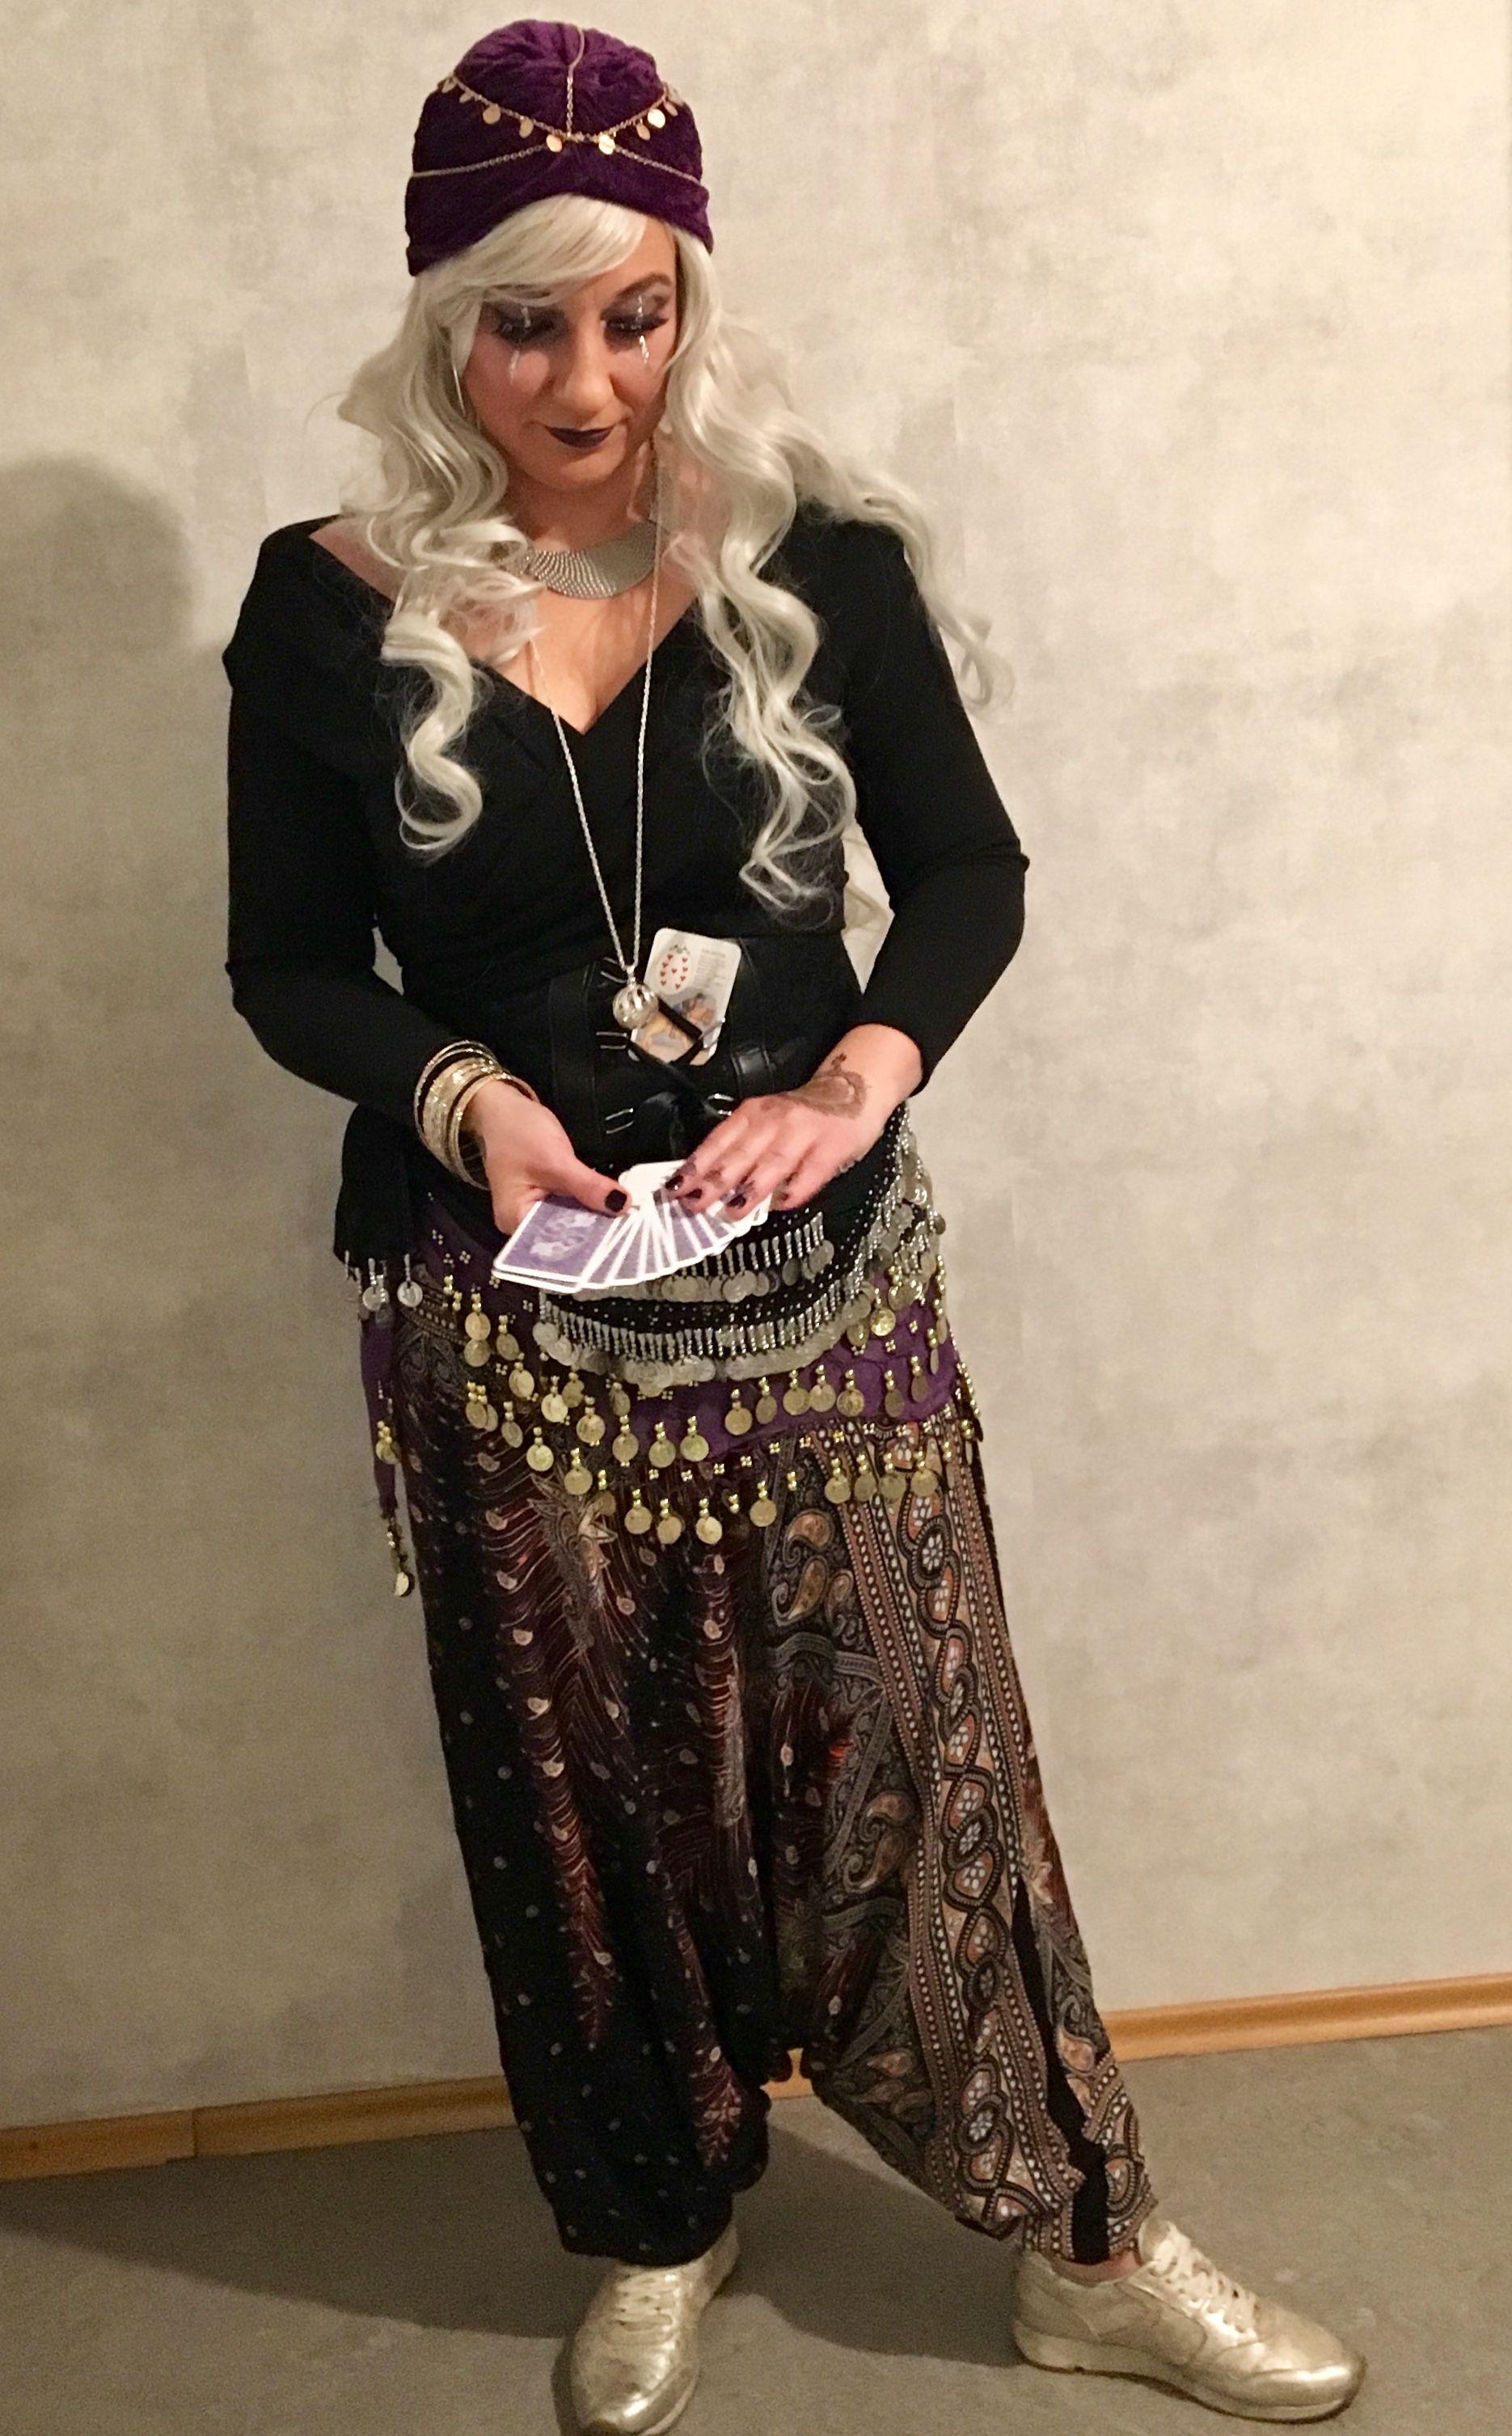 #Wahrsagerin #Fortuneteller  #Kostüm #Fasching #Karneval #Halloween #DIY #gruppenkostüme